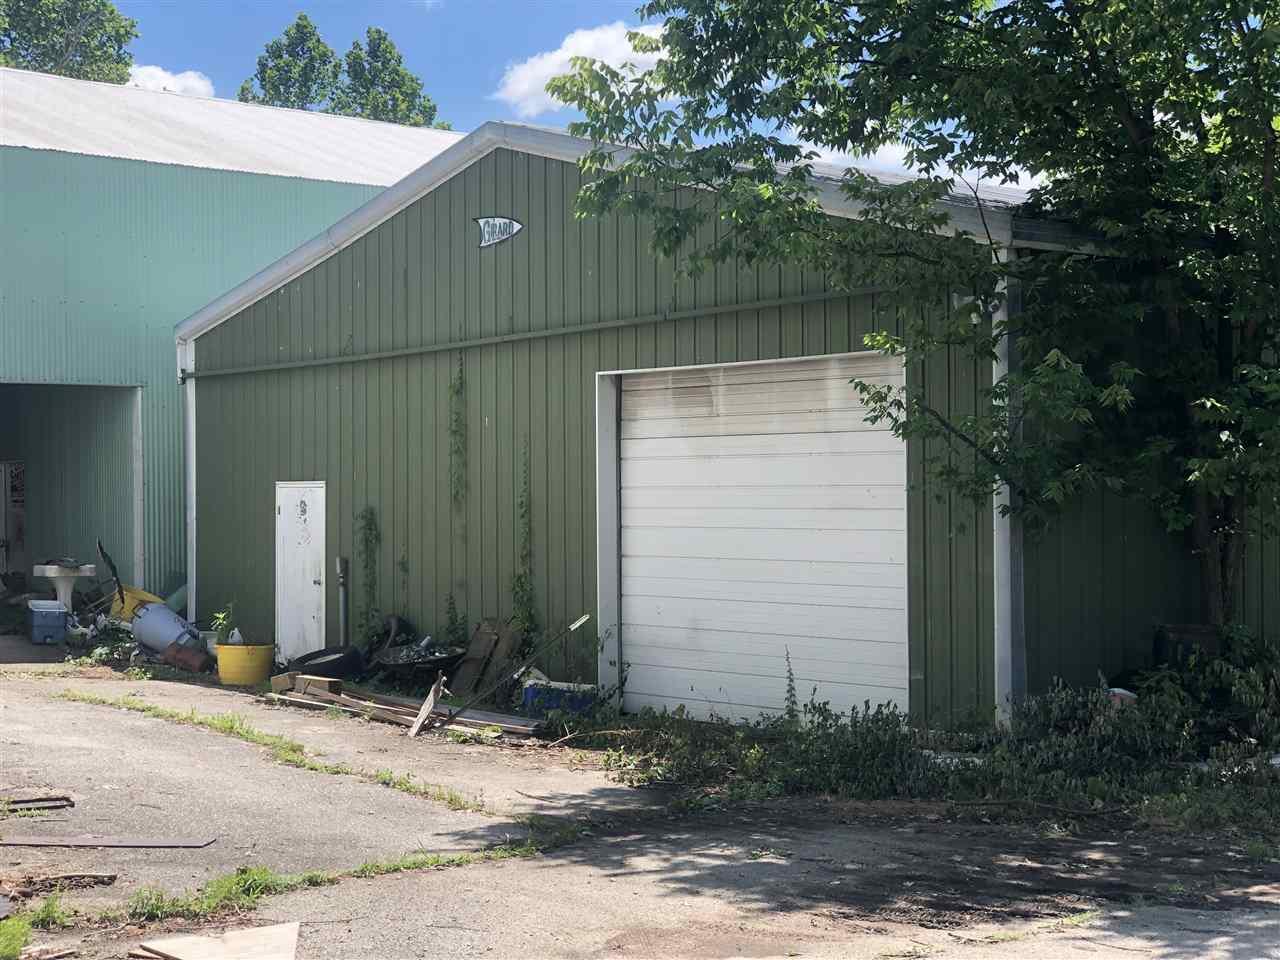 Photo 2 for 655 Crittenden Gratz, KY 40359